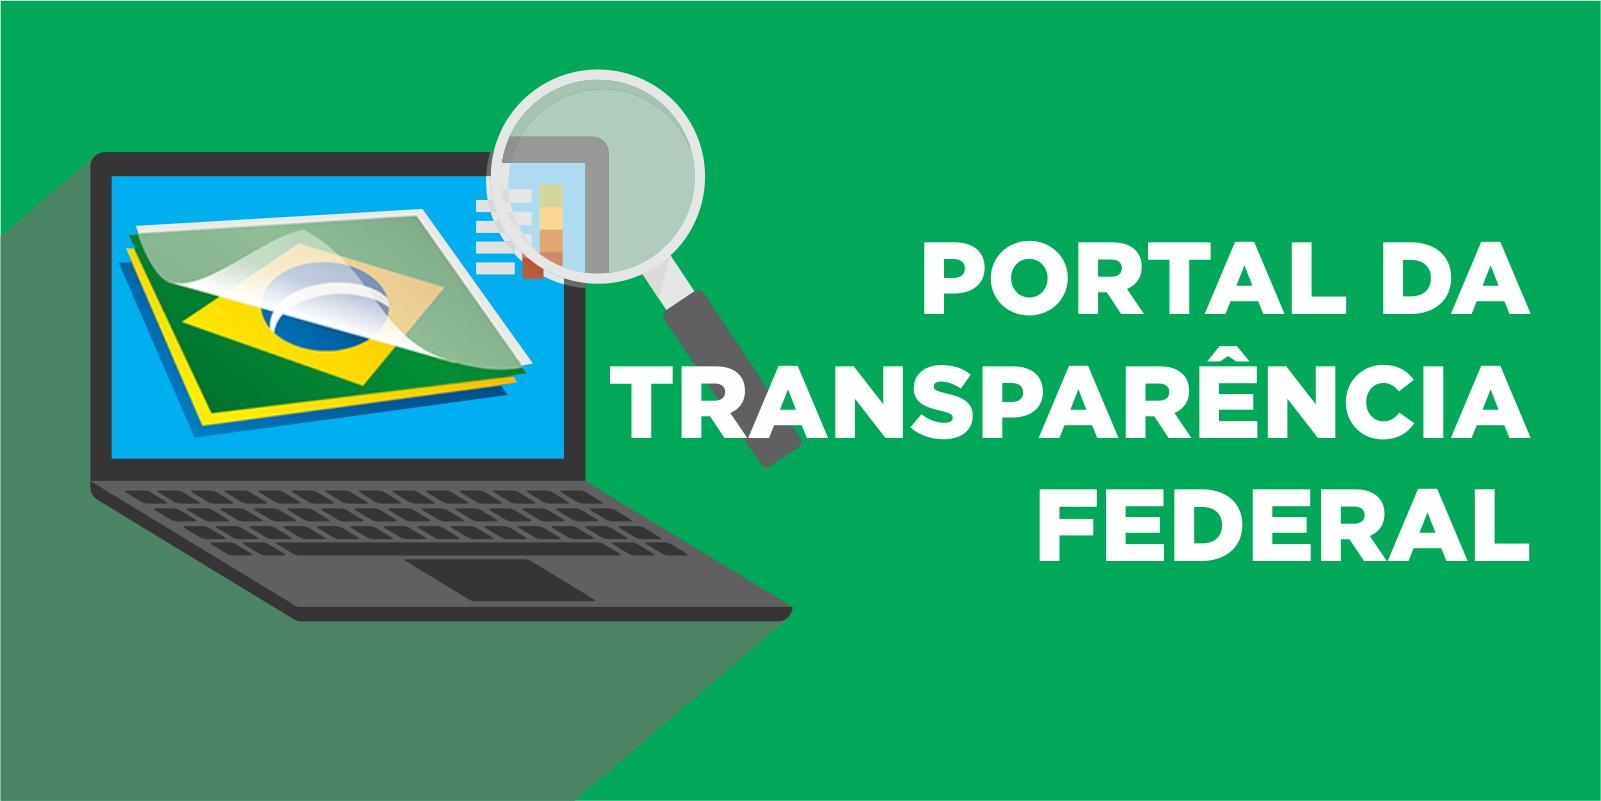 Portal da Transparência Federal